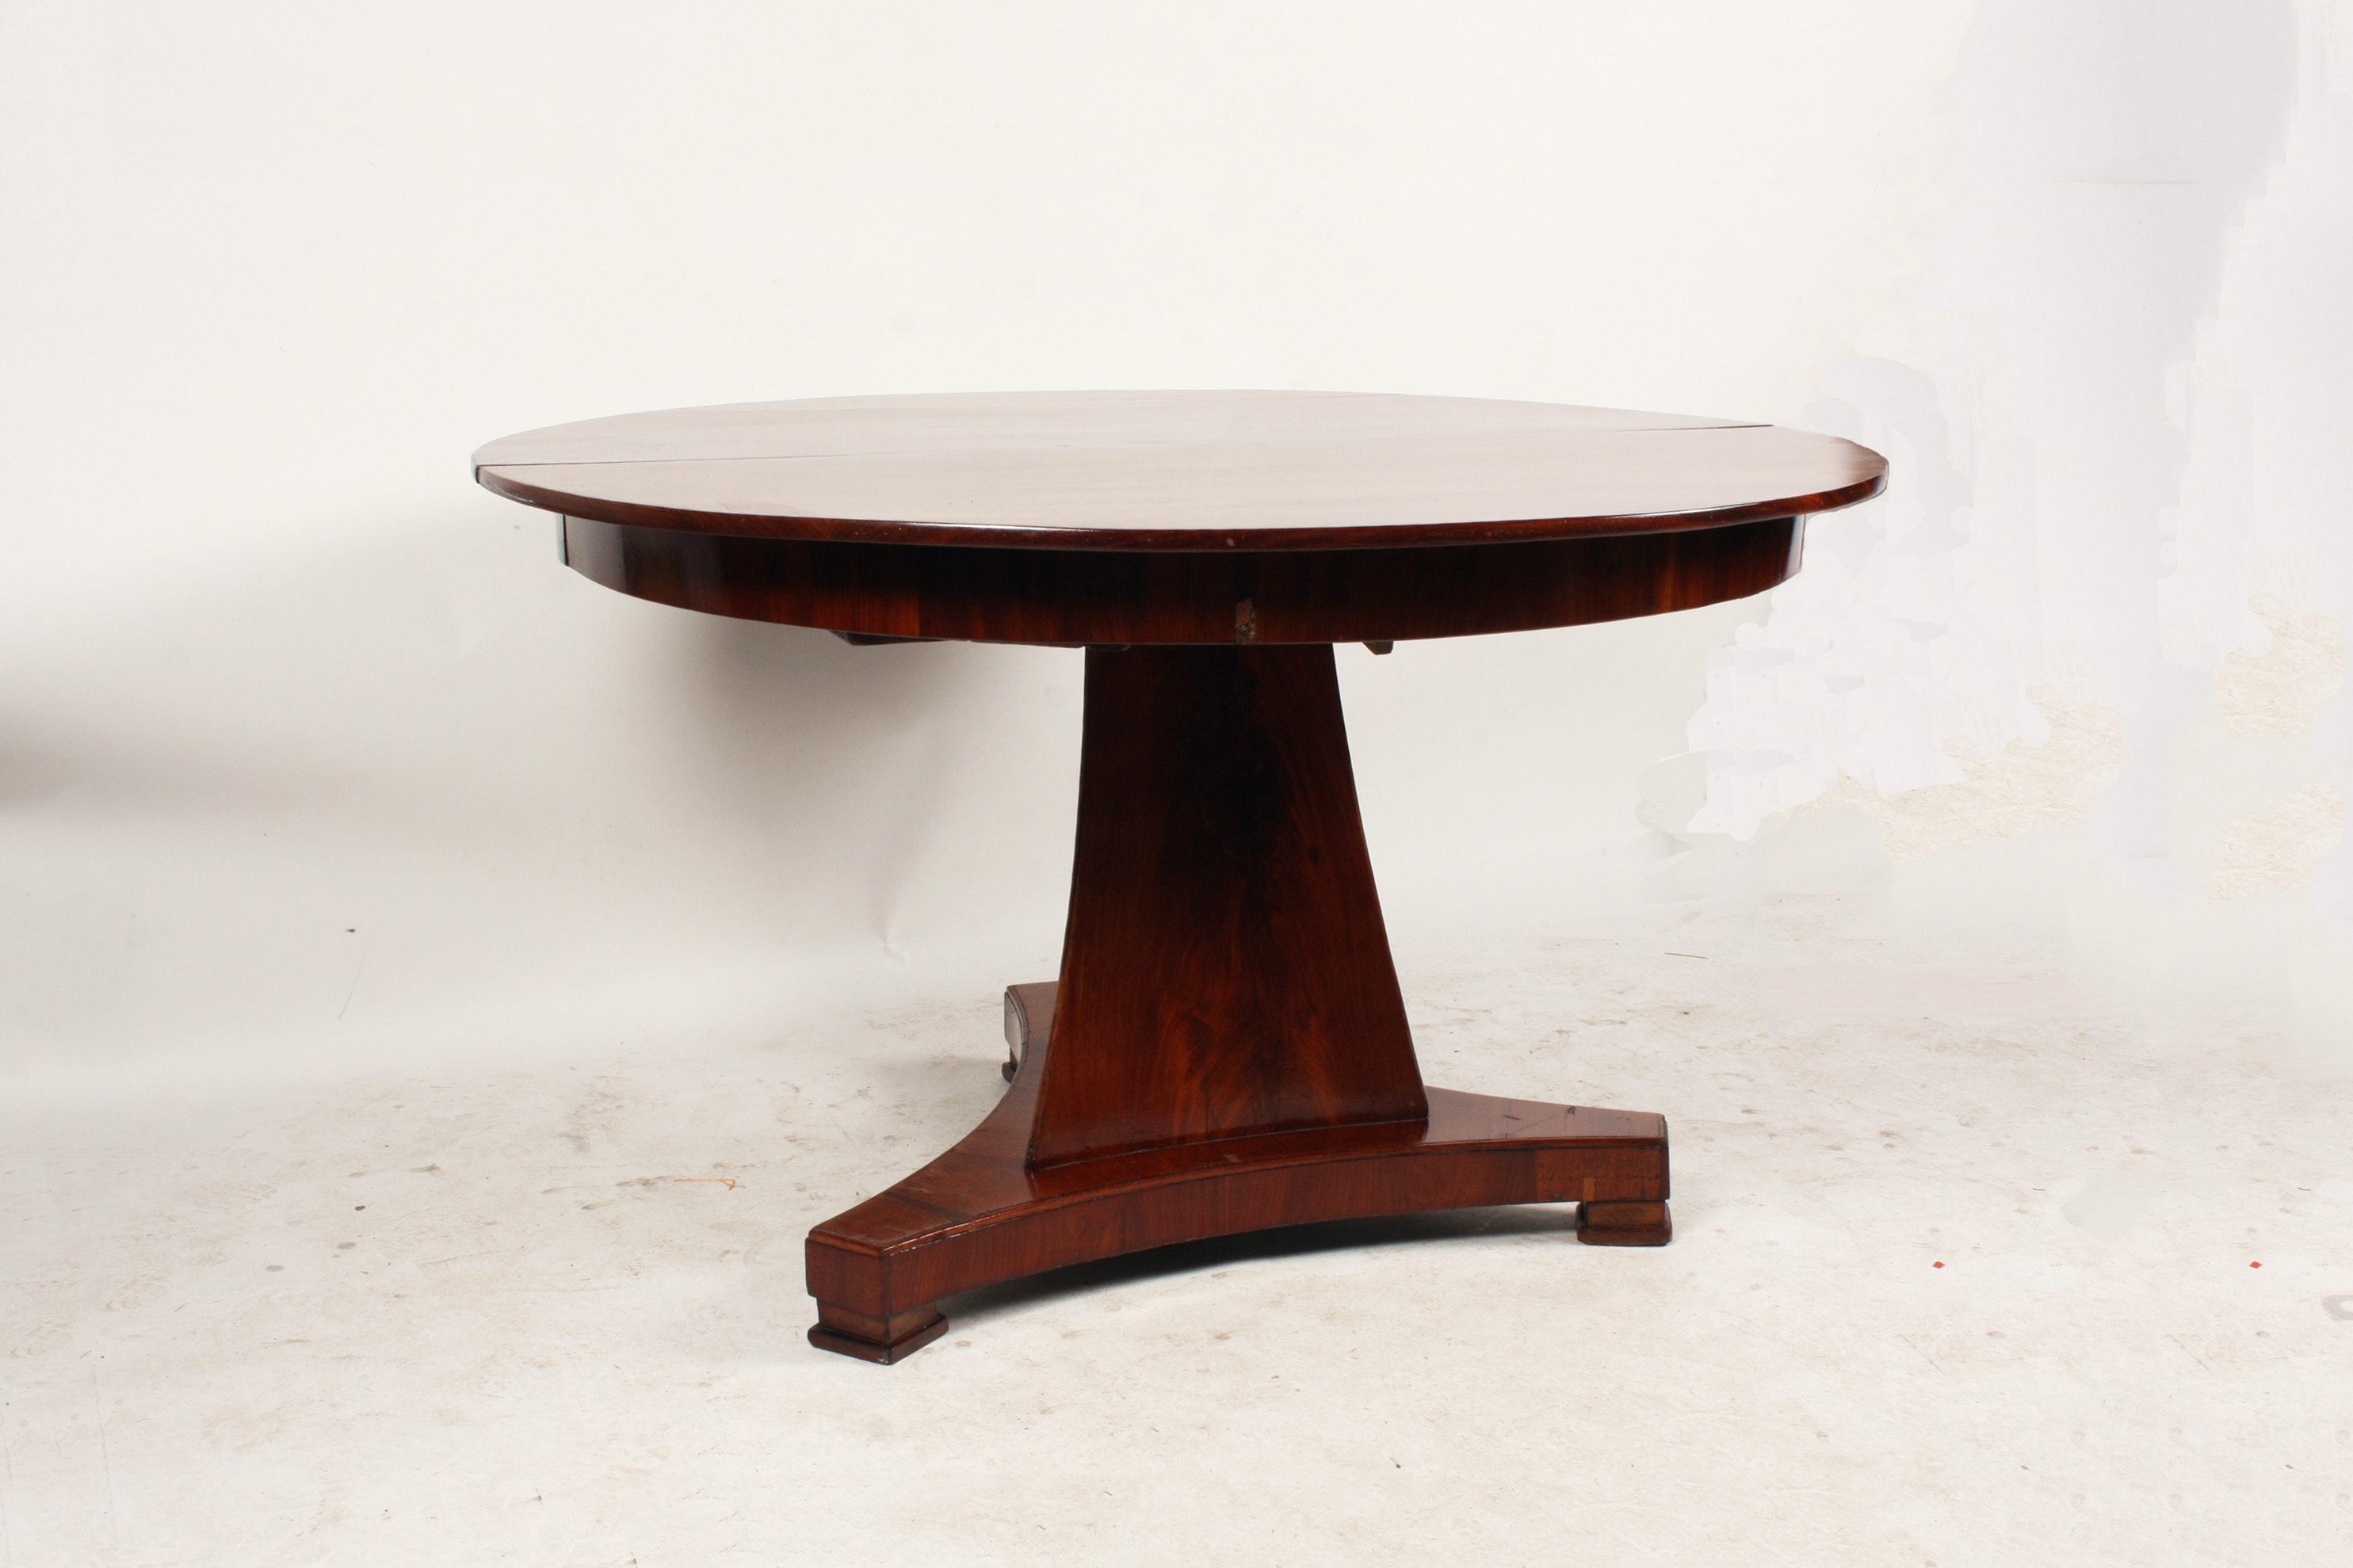 Vintage Regency Style Walnut Round Dining Table